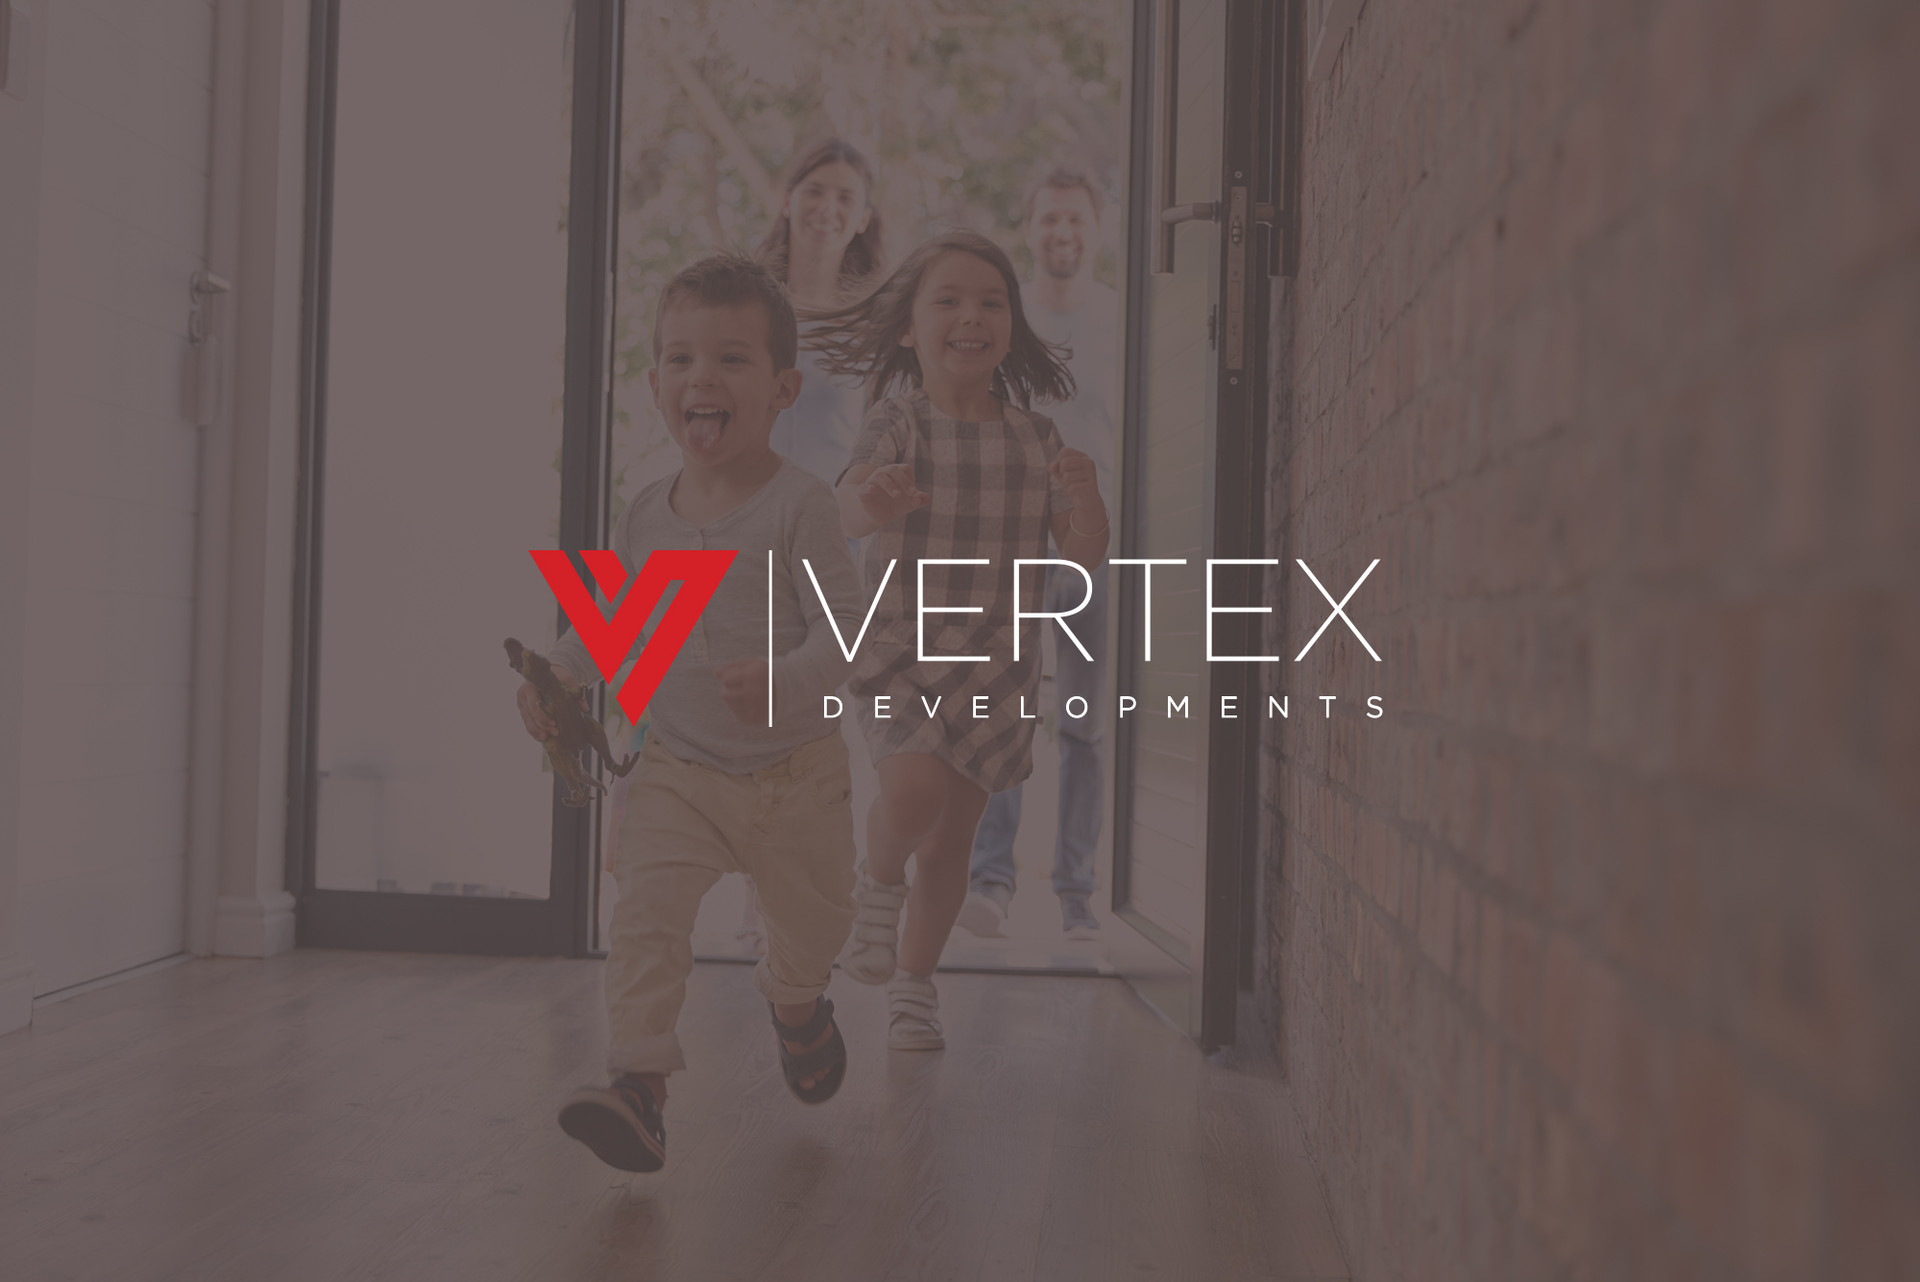 VERTEX Developments